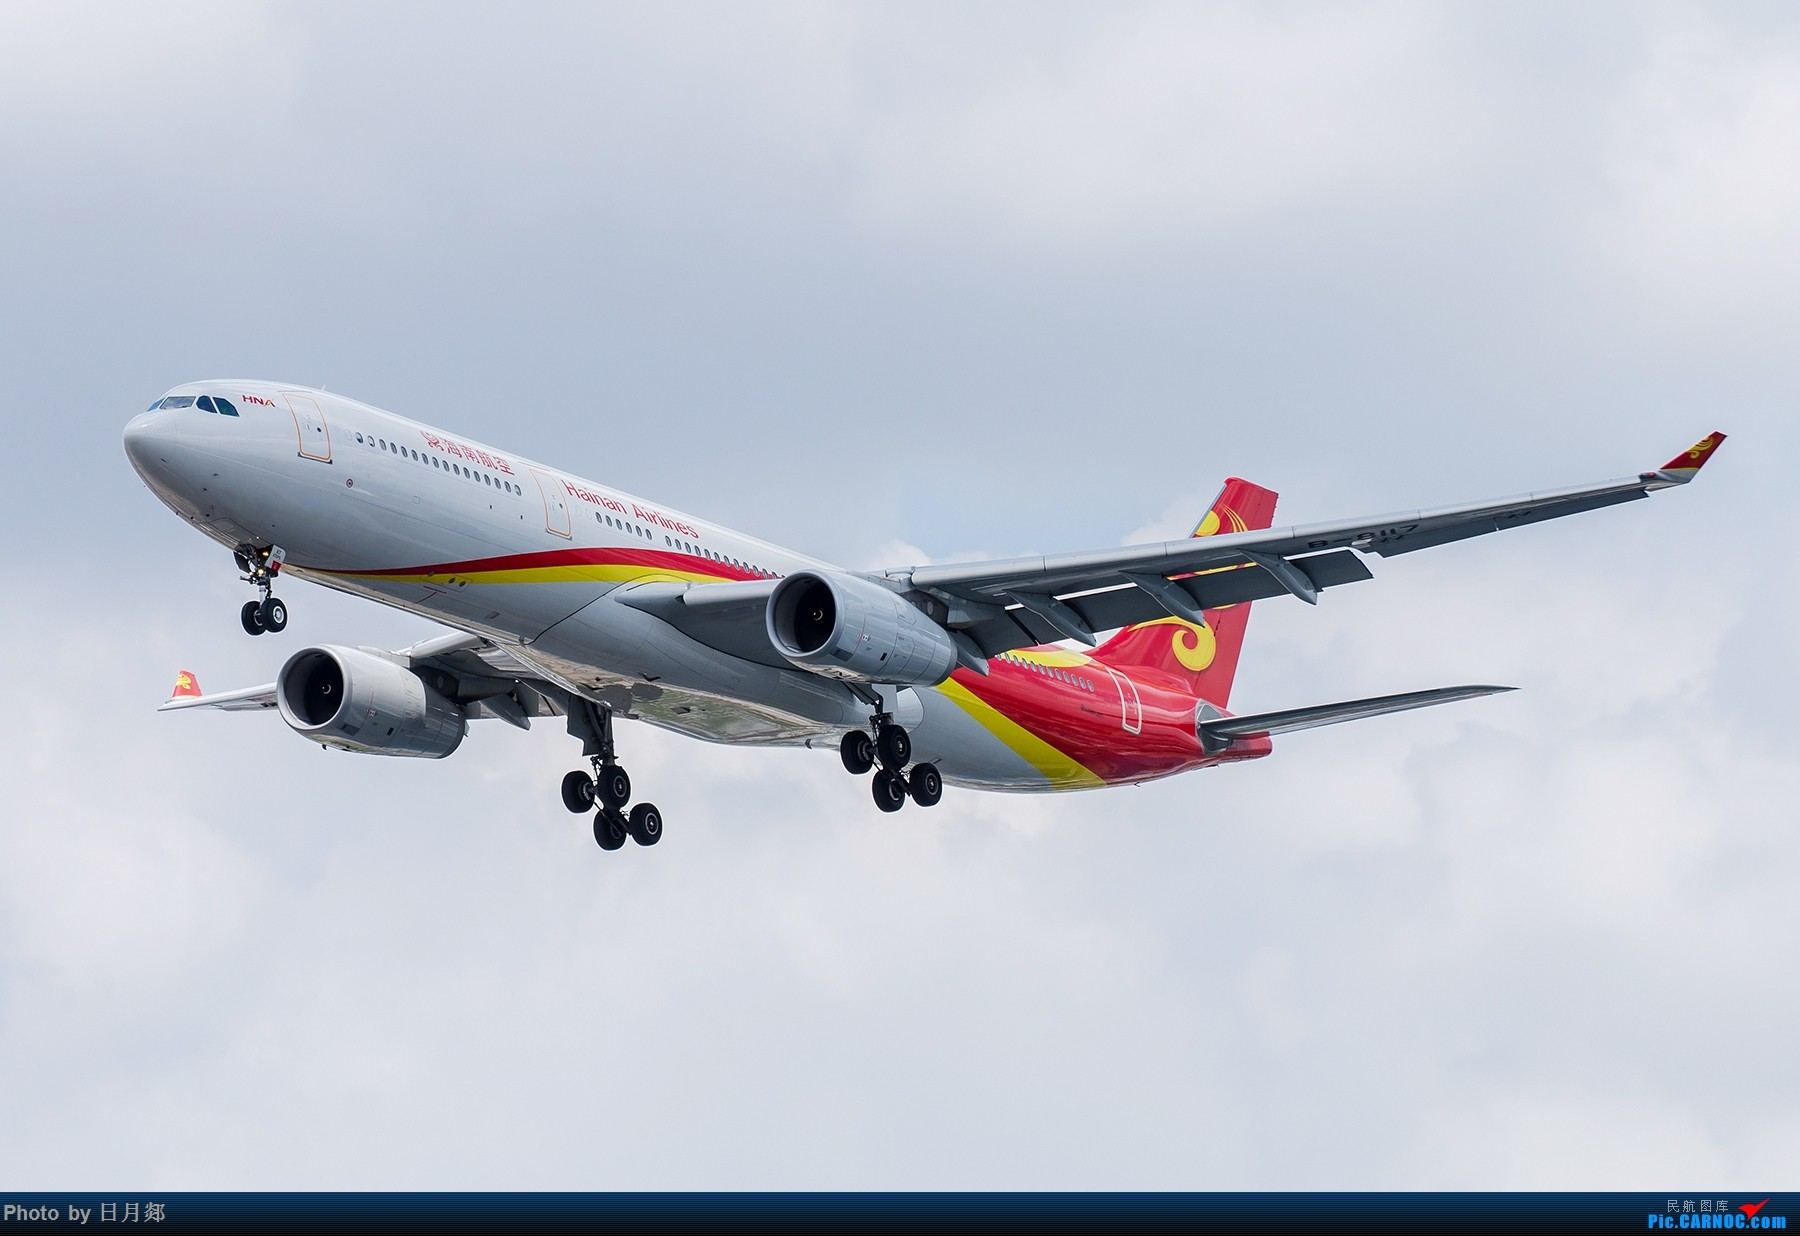 Re:[原创]【SHA拍机*1800大图】图要抓紧发,不然就要炒冷饭,大头镇贴 AIRBUS A330-300 B-8117 中国上海虹桥国际机场